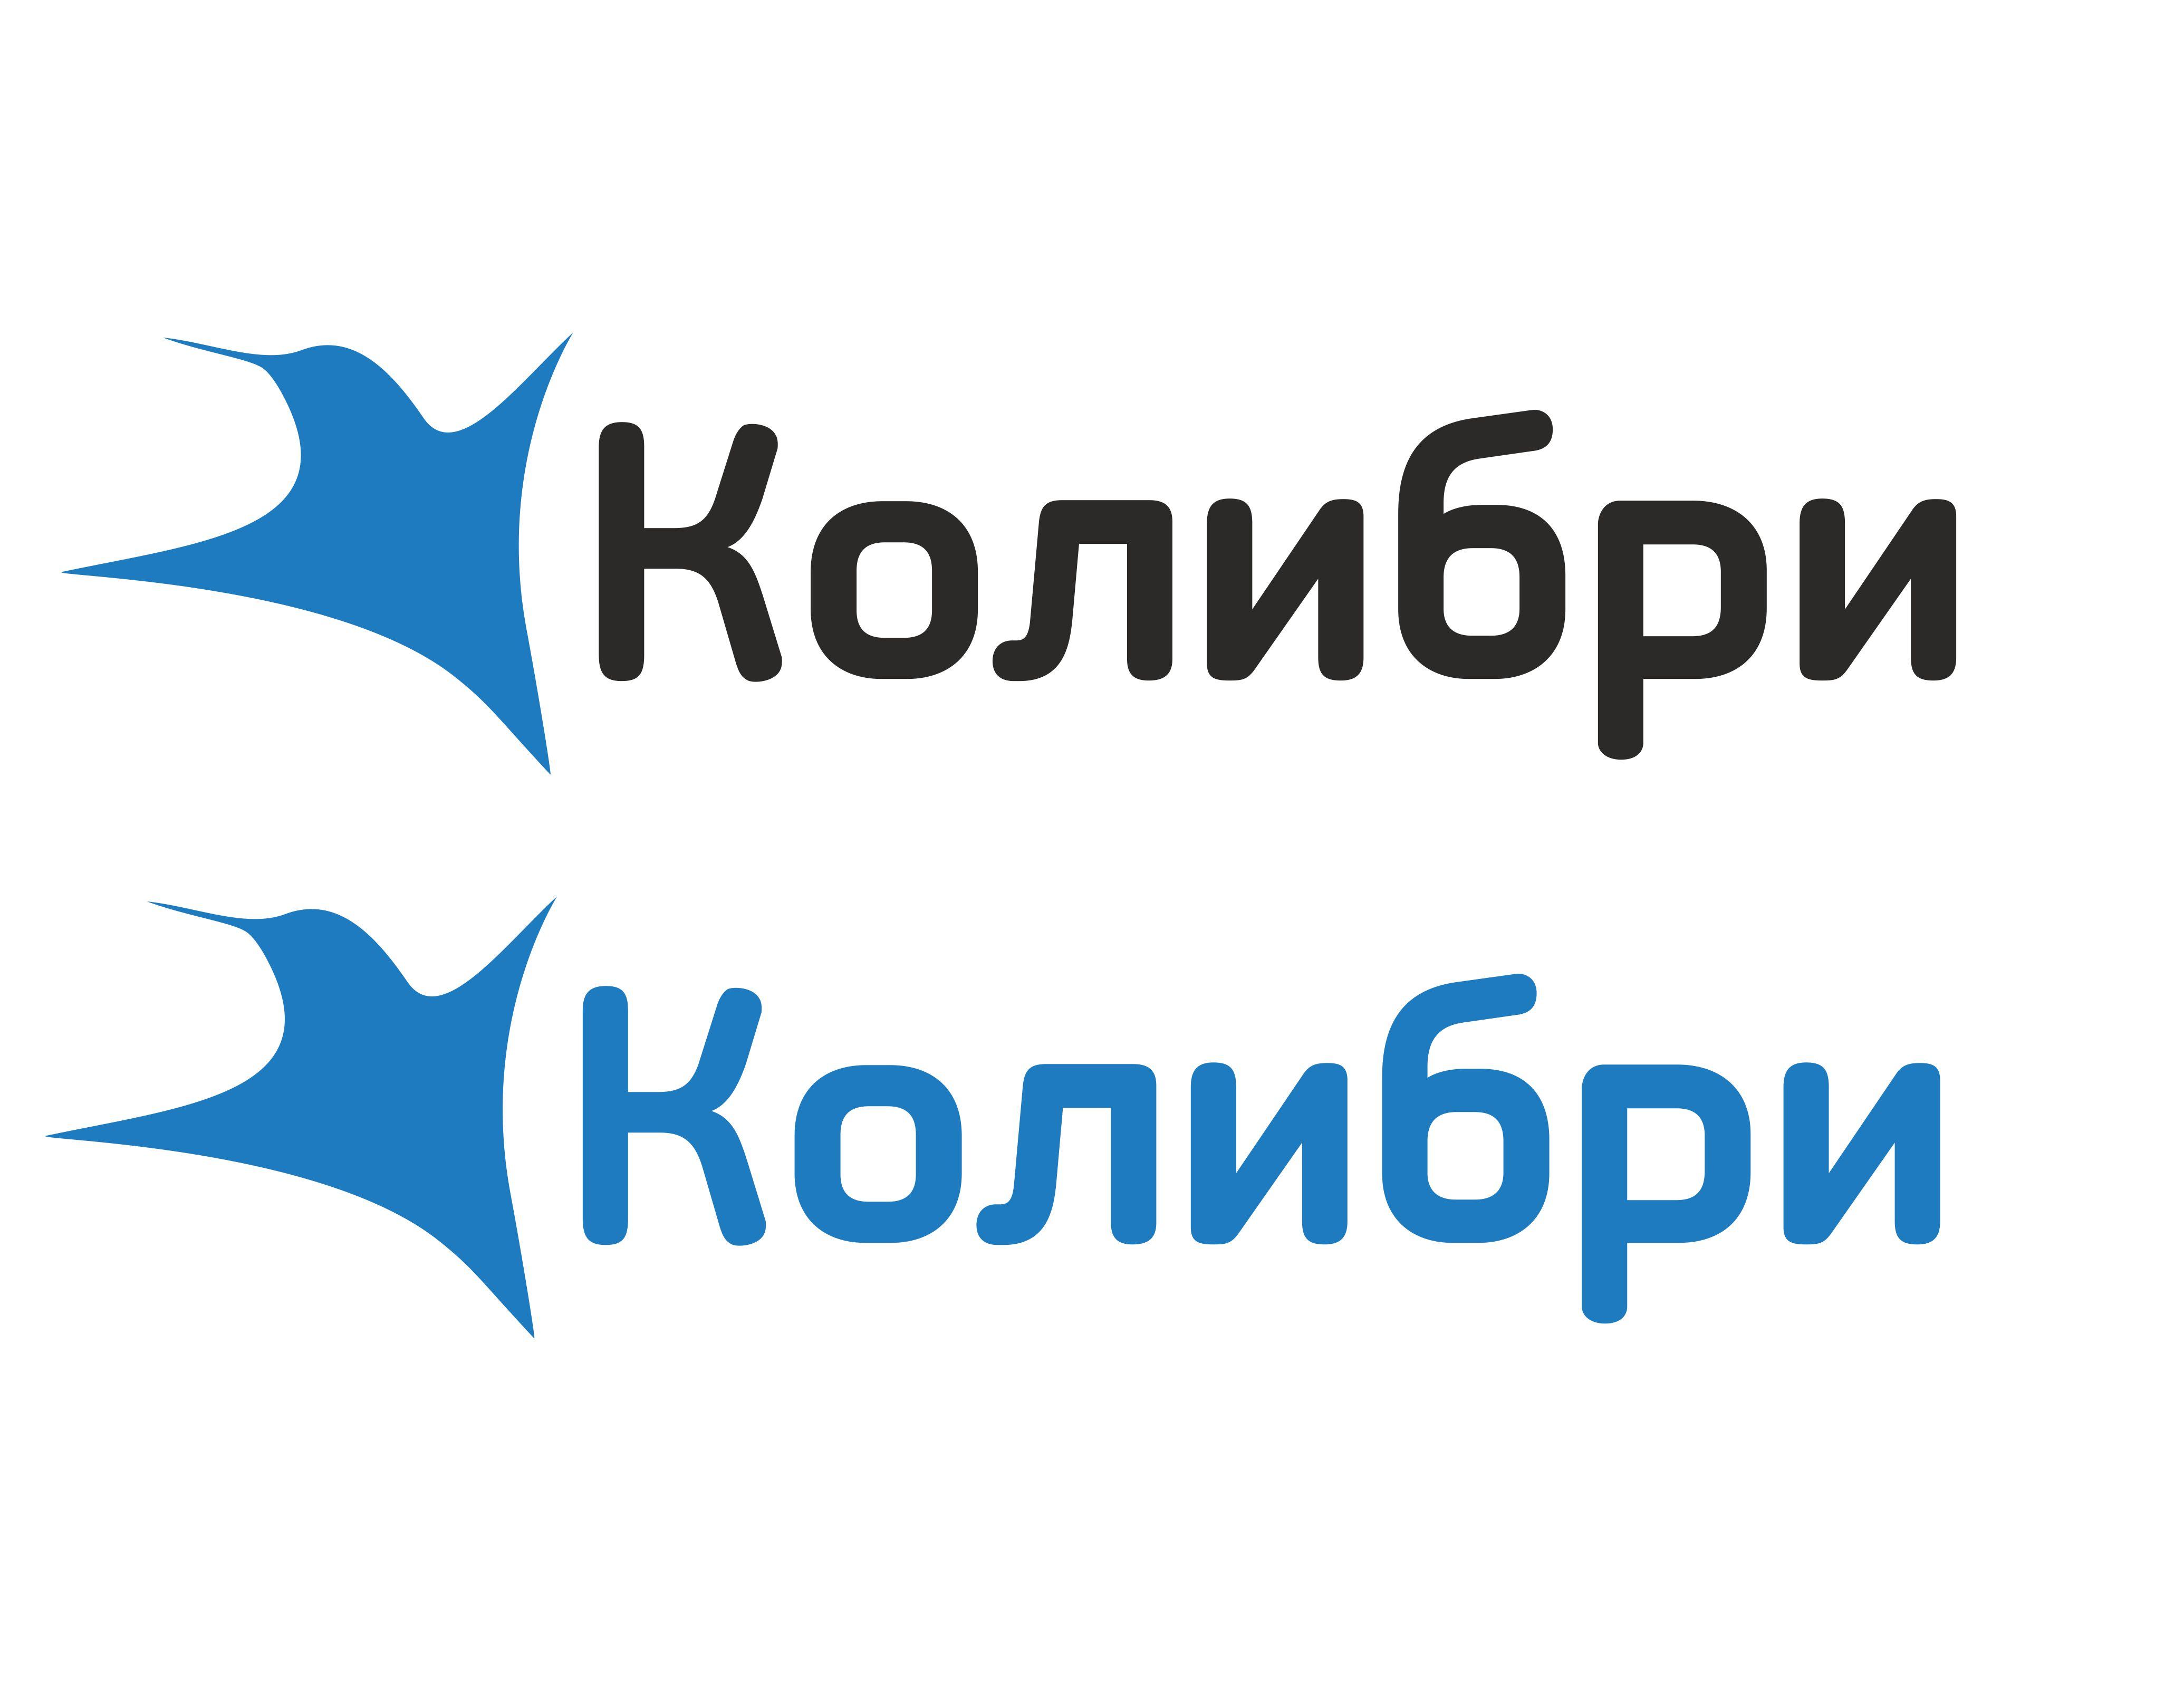 Дизайнер, разработка логотипа компании фото f_9365580575a163bd.jpg